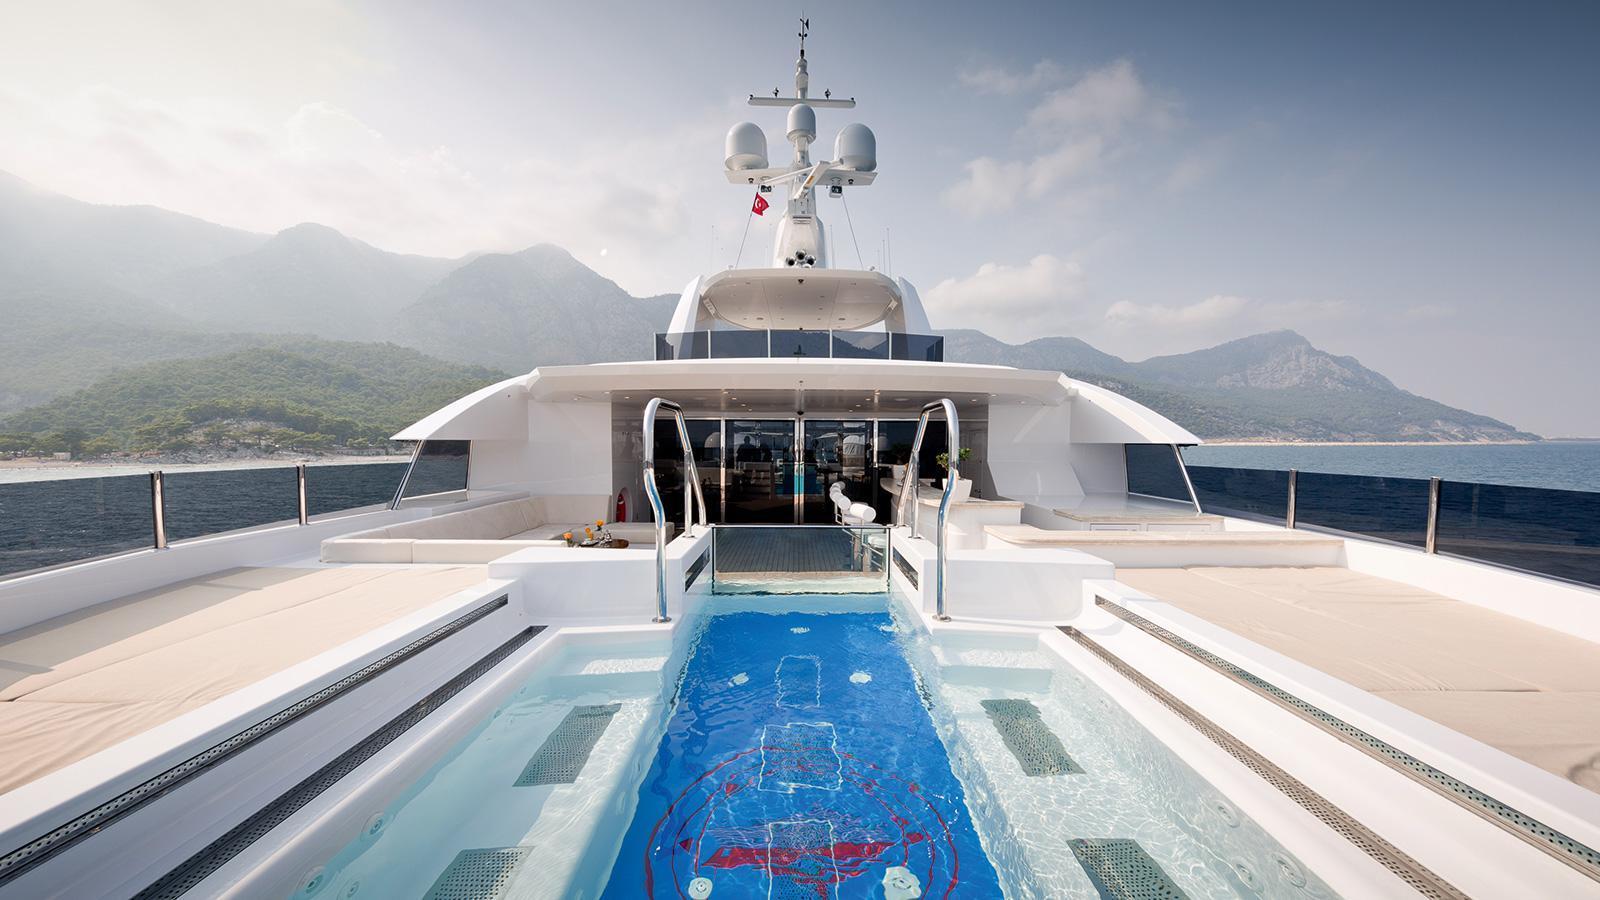 irimari-motor-yacht-sunrise-2015-63m-pool-on-deck